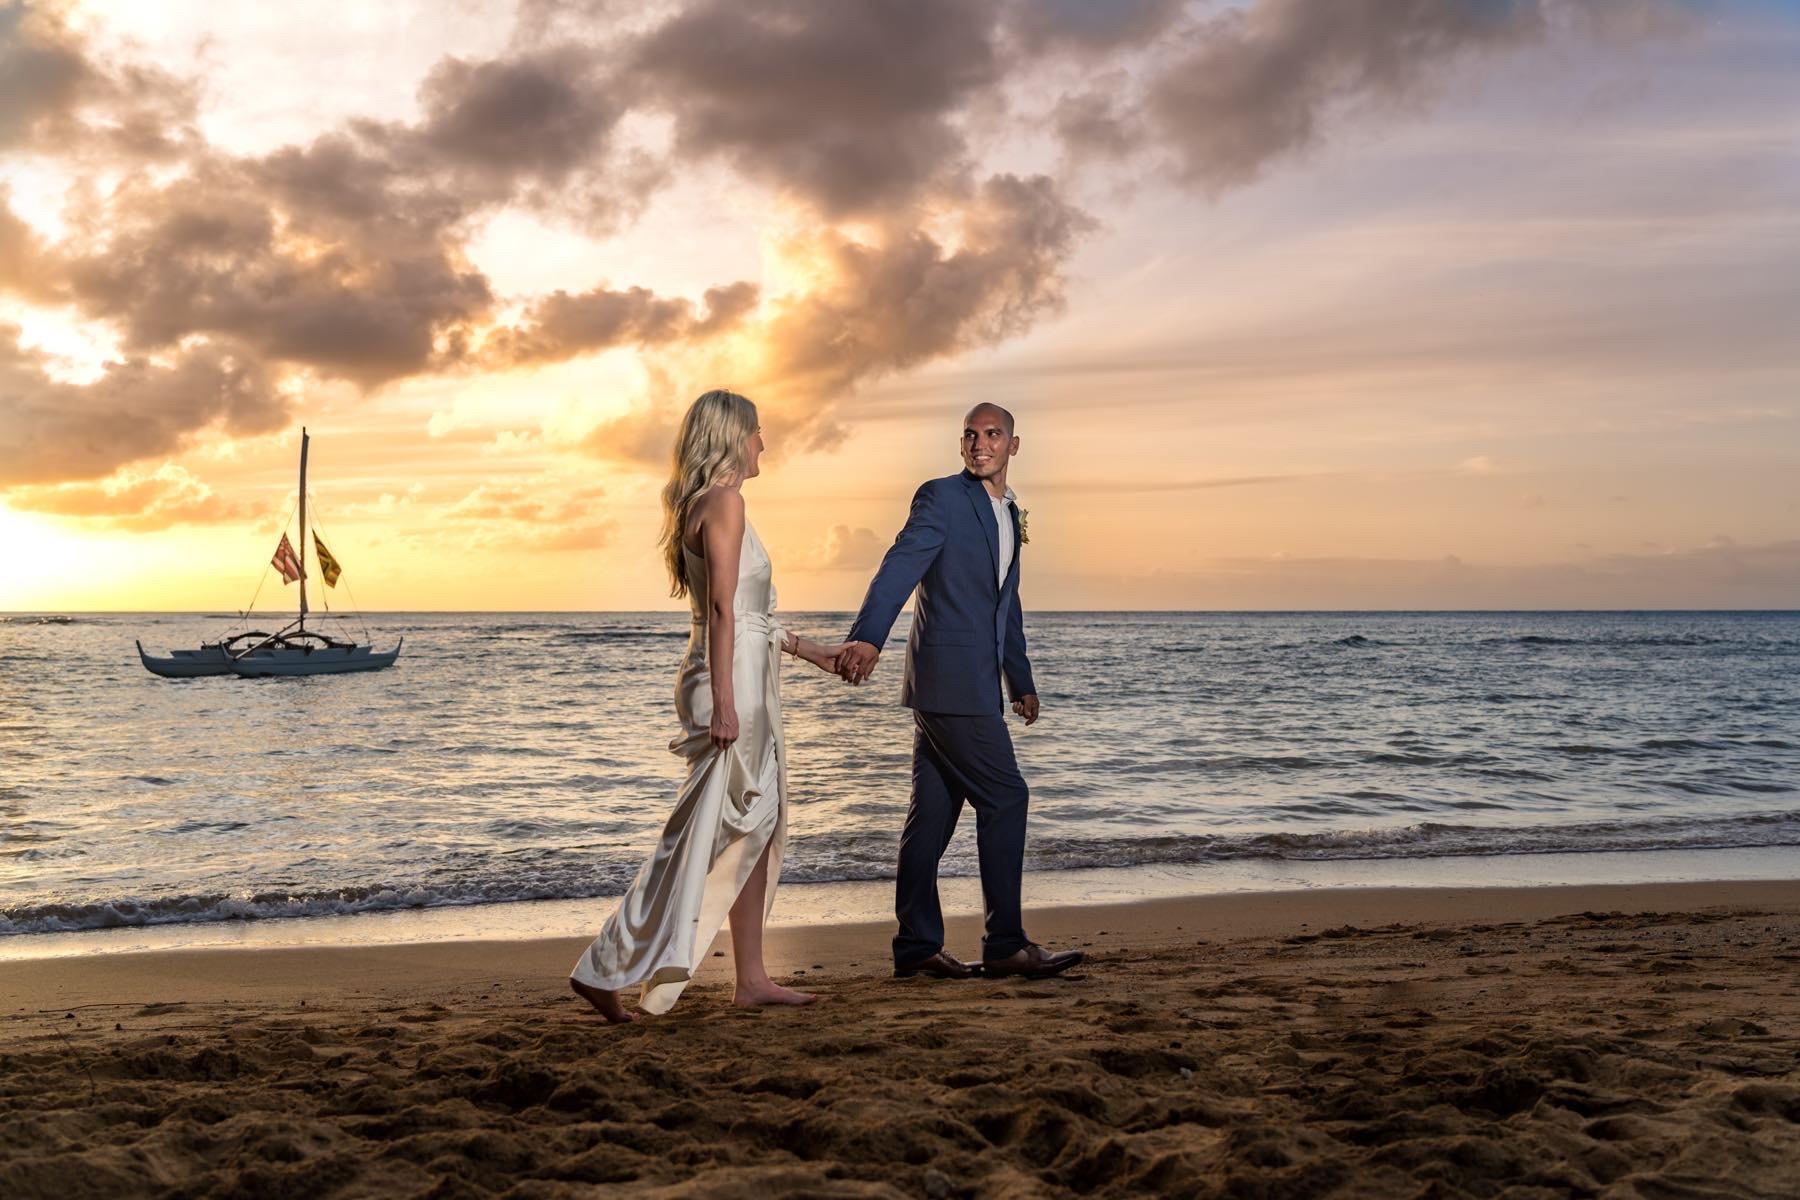 Sheena and Michael walking on the beach.